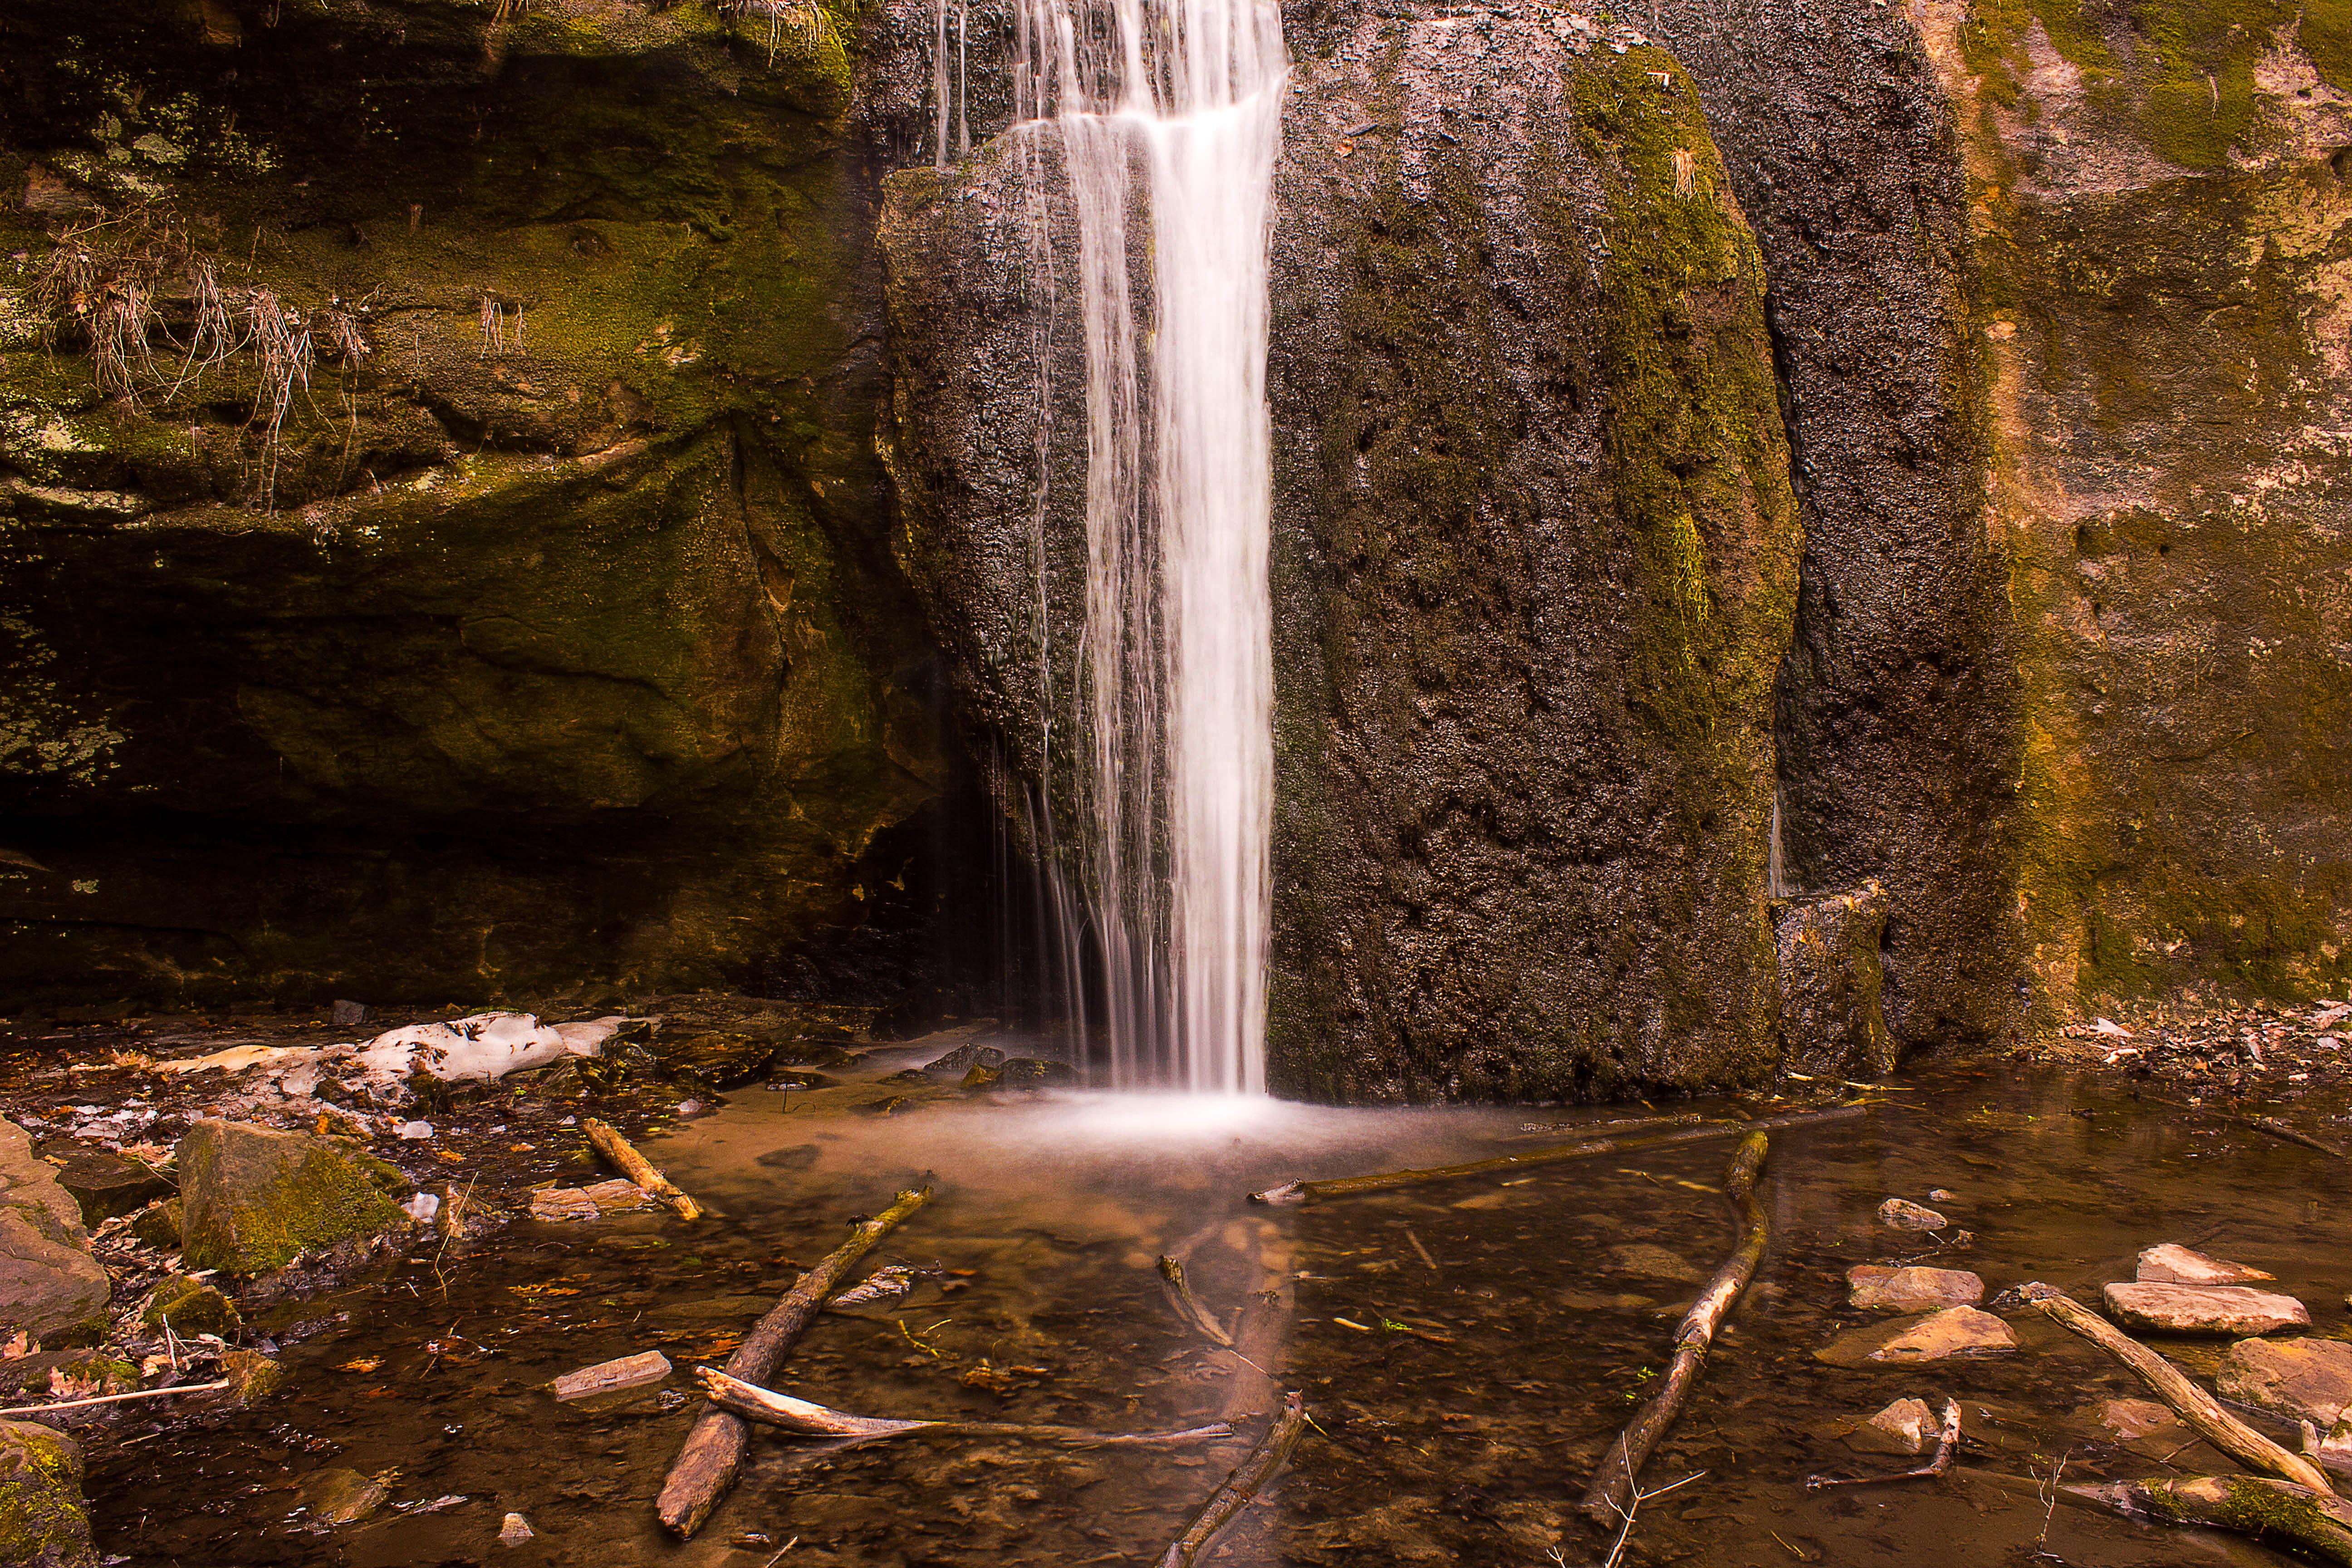 Stephen's Falls